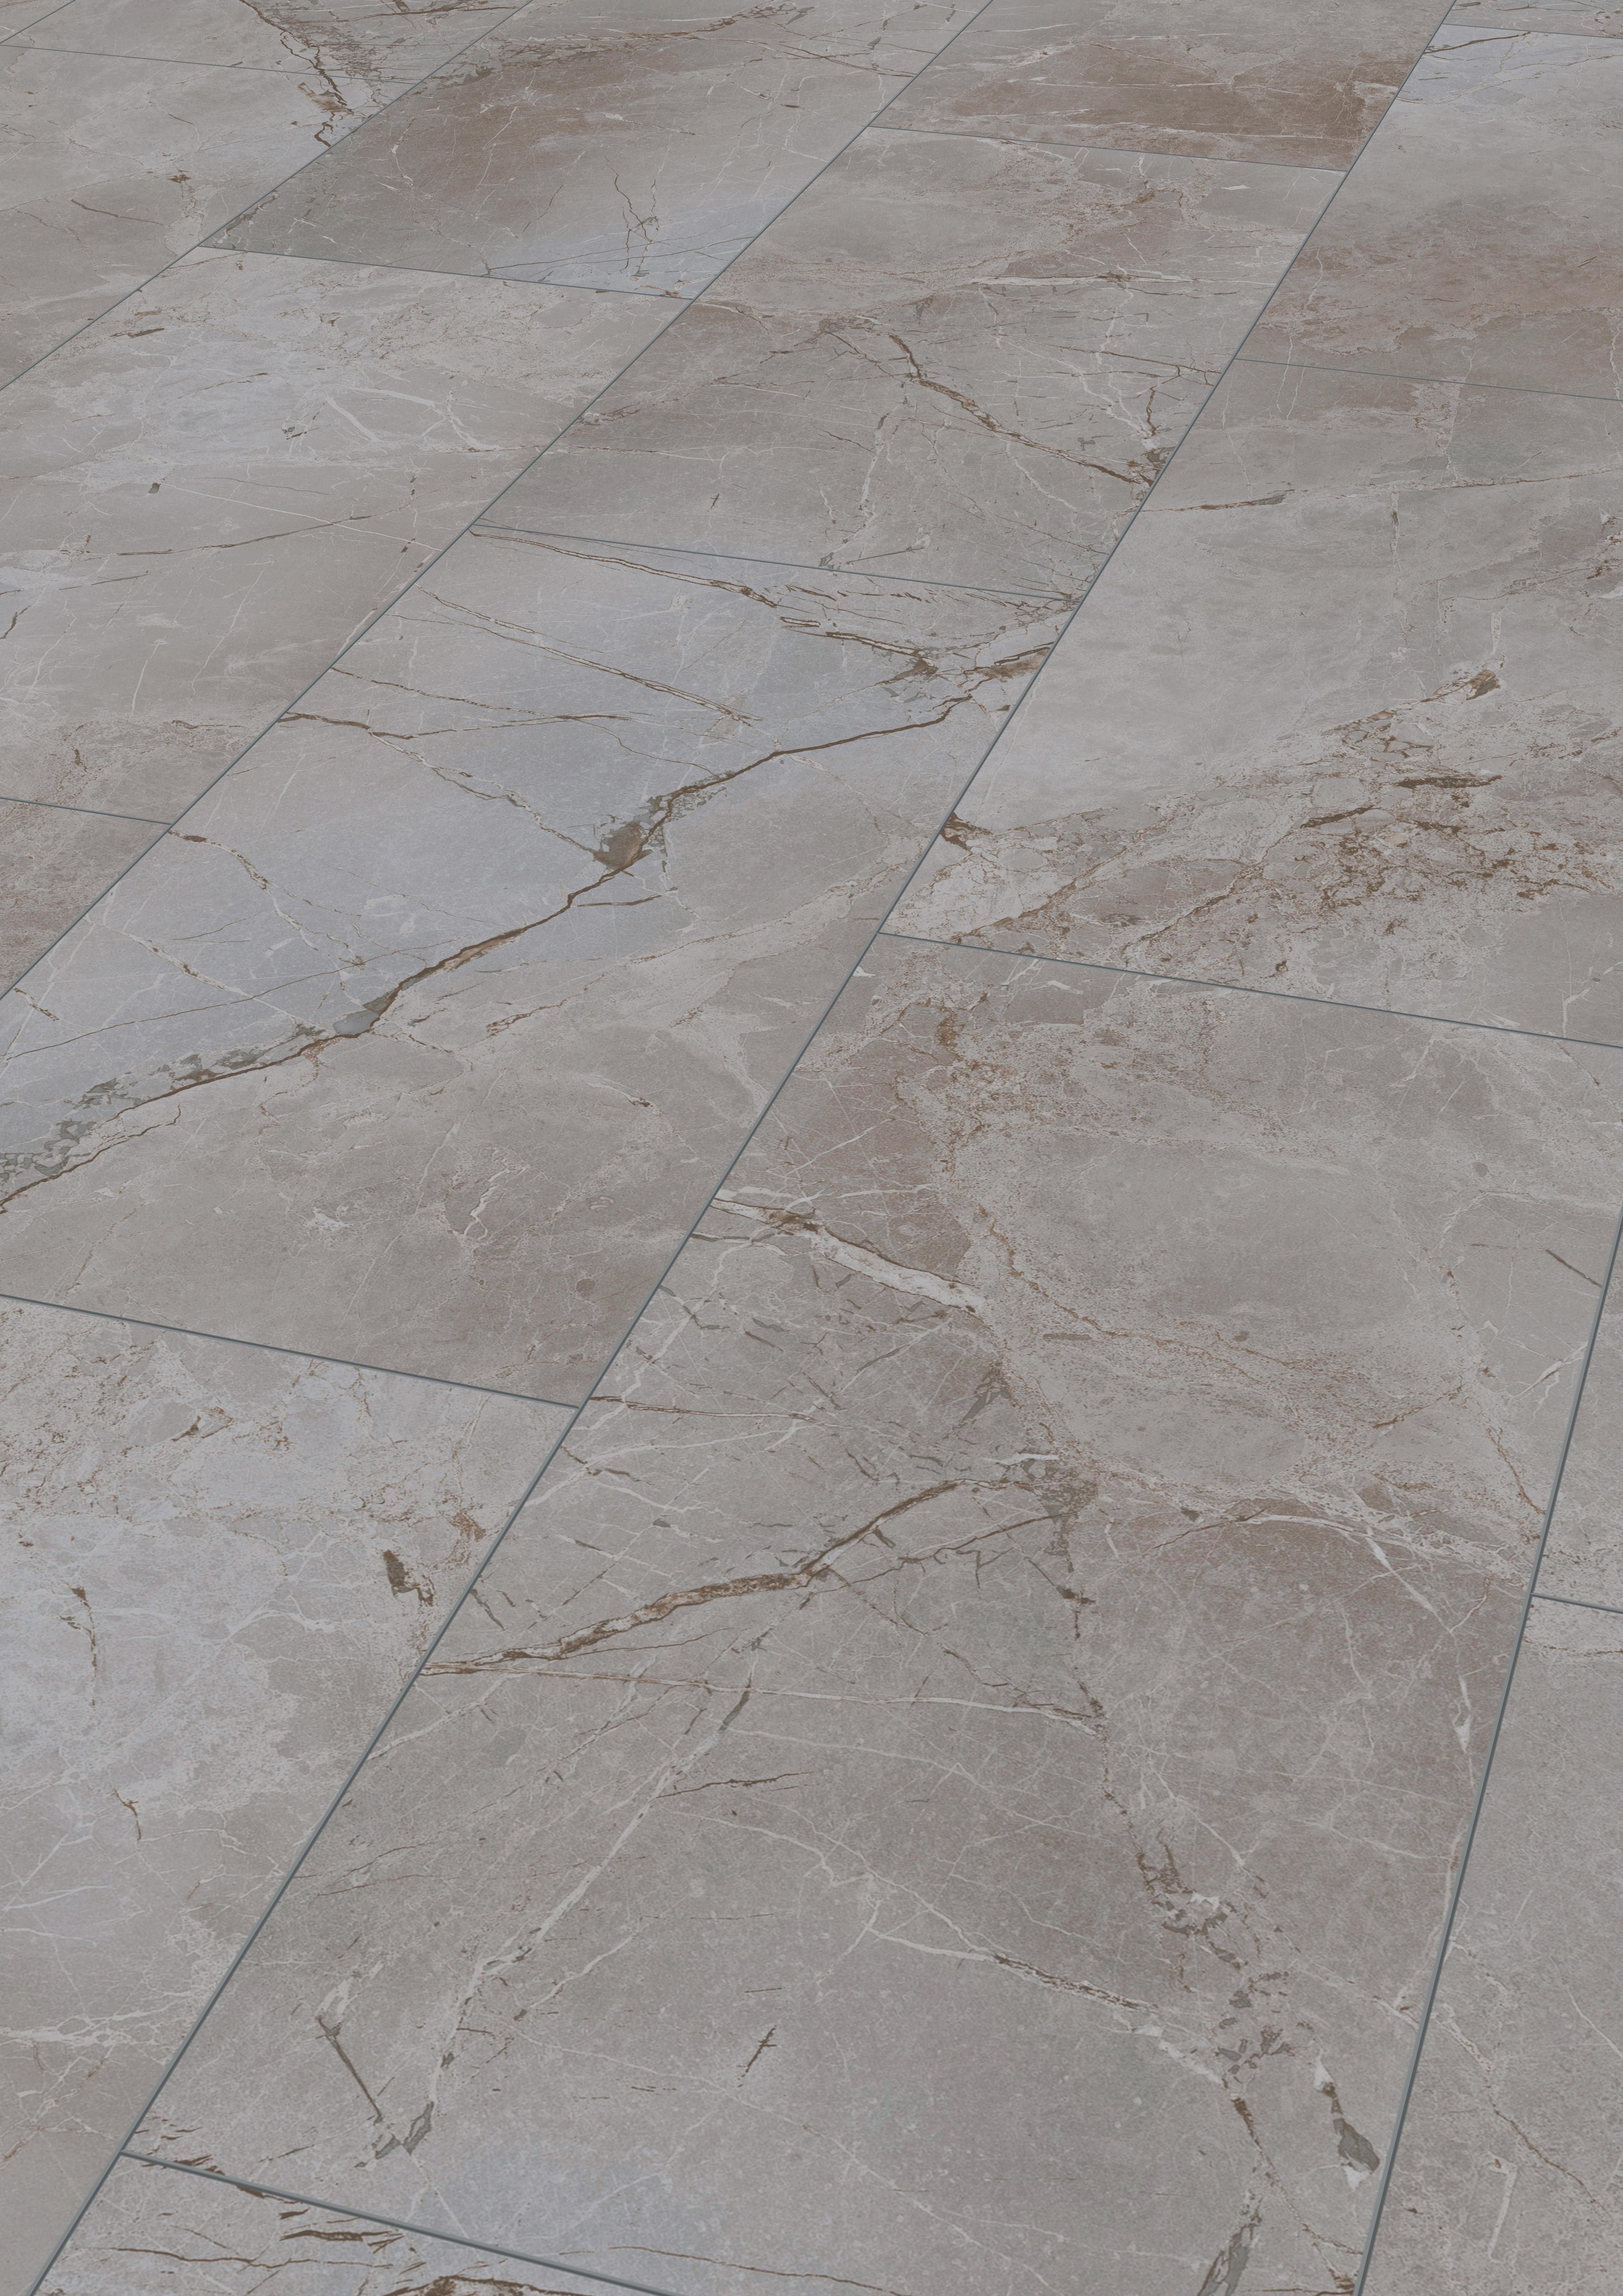 floors travertine impression flooring htm kronospan stone palatino floor rubber vision bathroom laminate for and tile